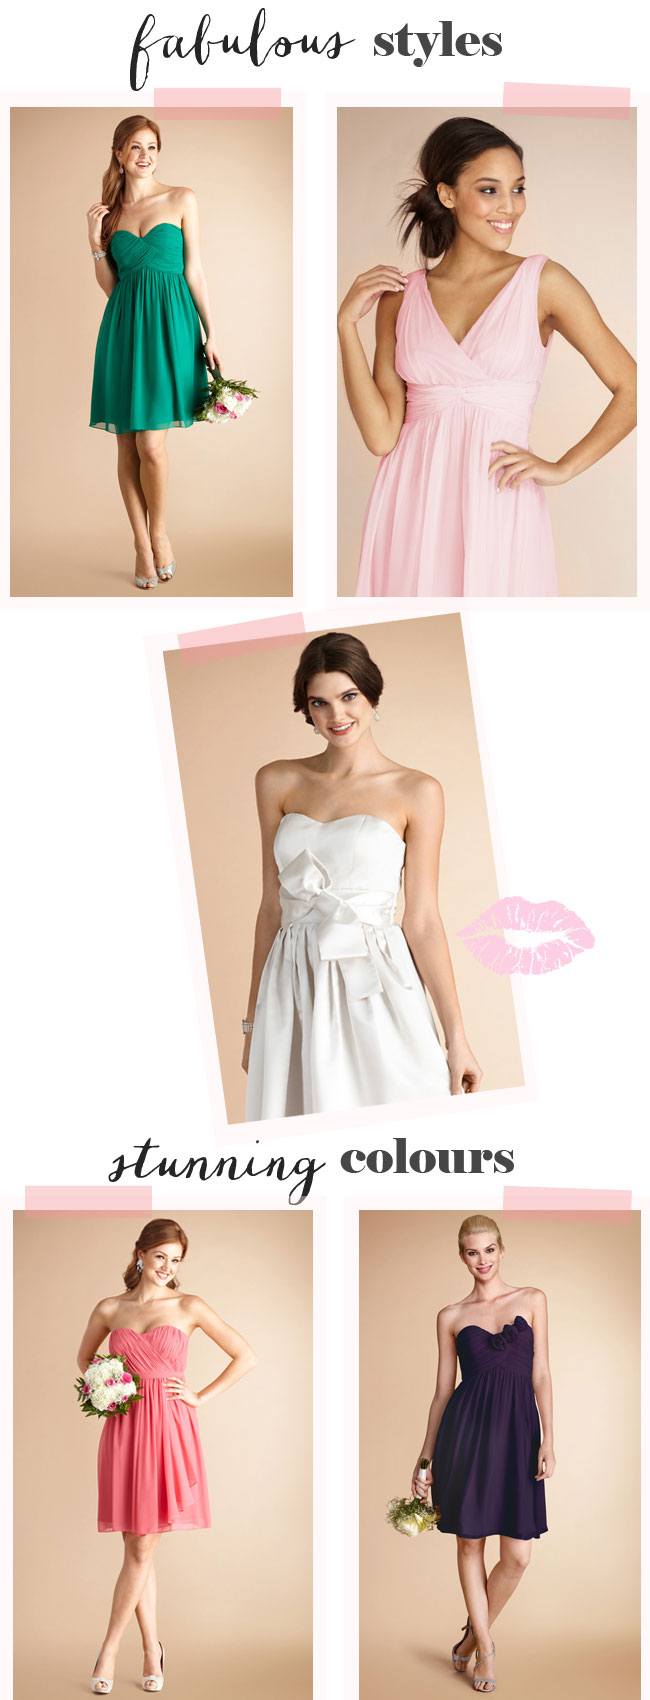 Short Bridesmaid Dresses 2014 from Bridesmaiddressesbuy